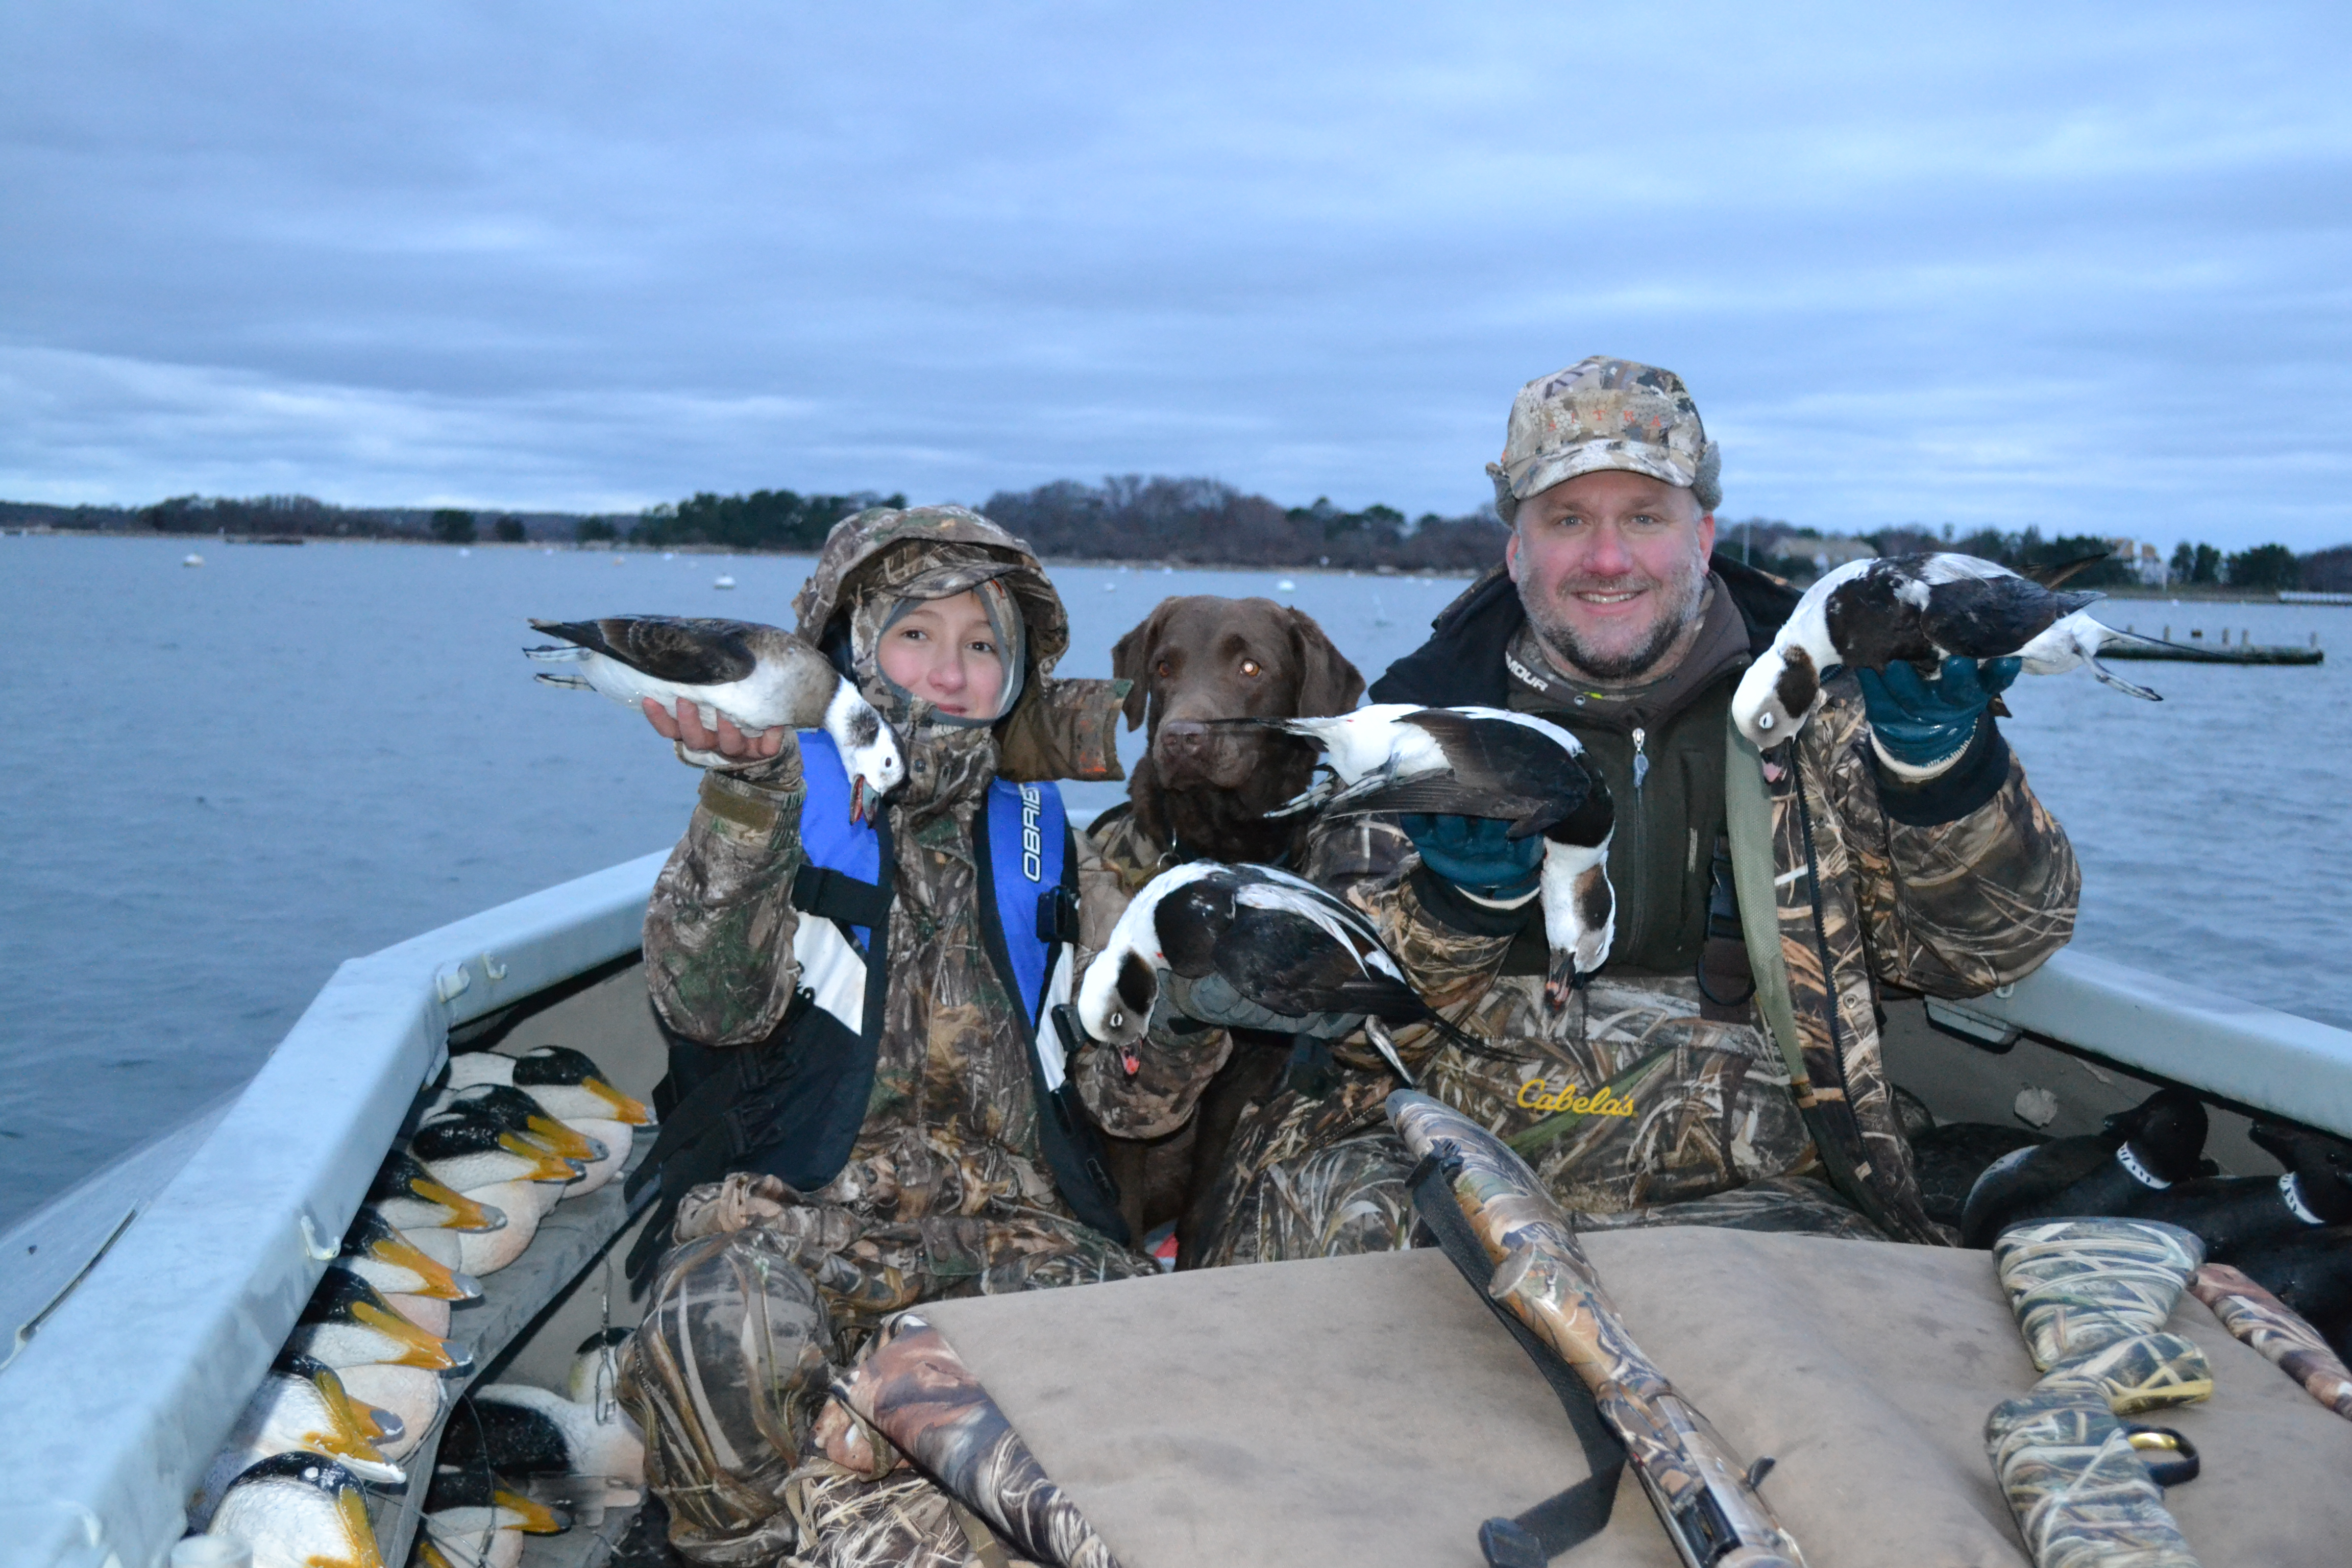 Cape Cod Waterfowling